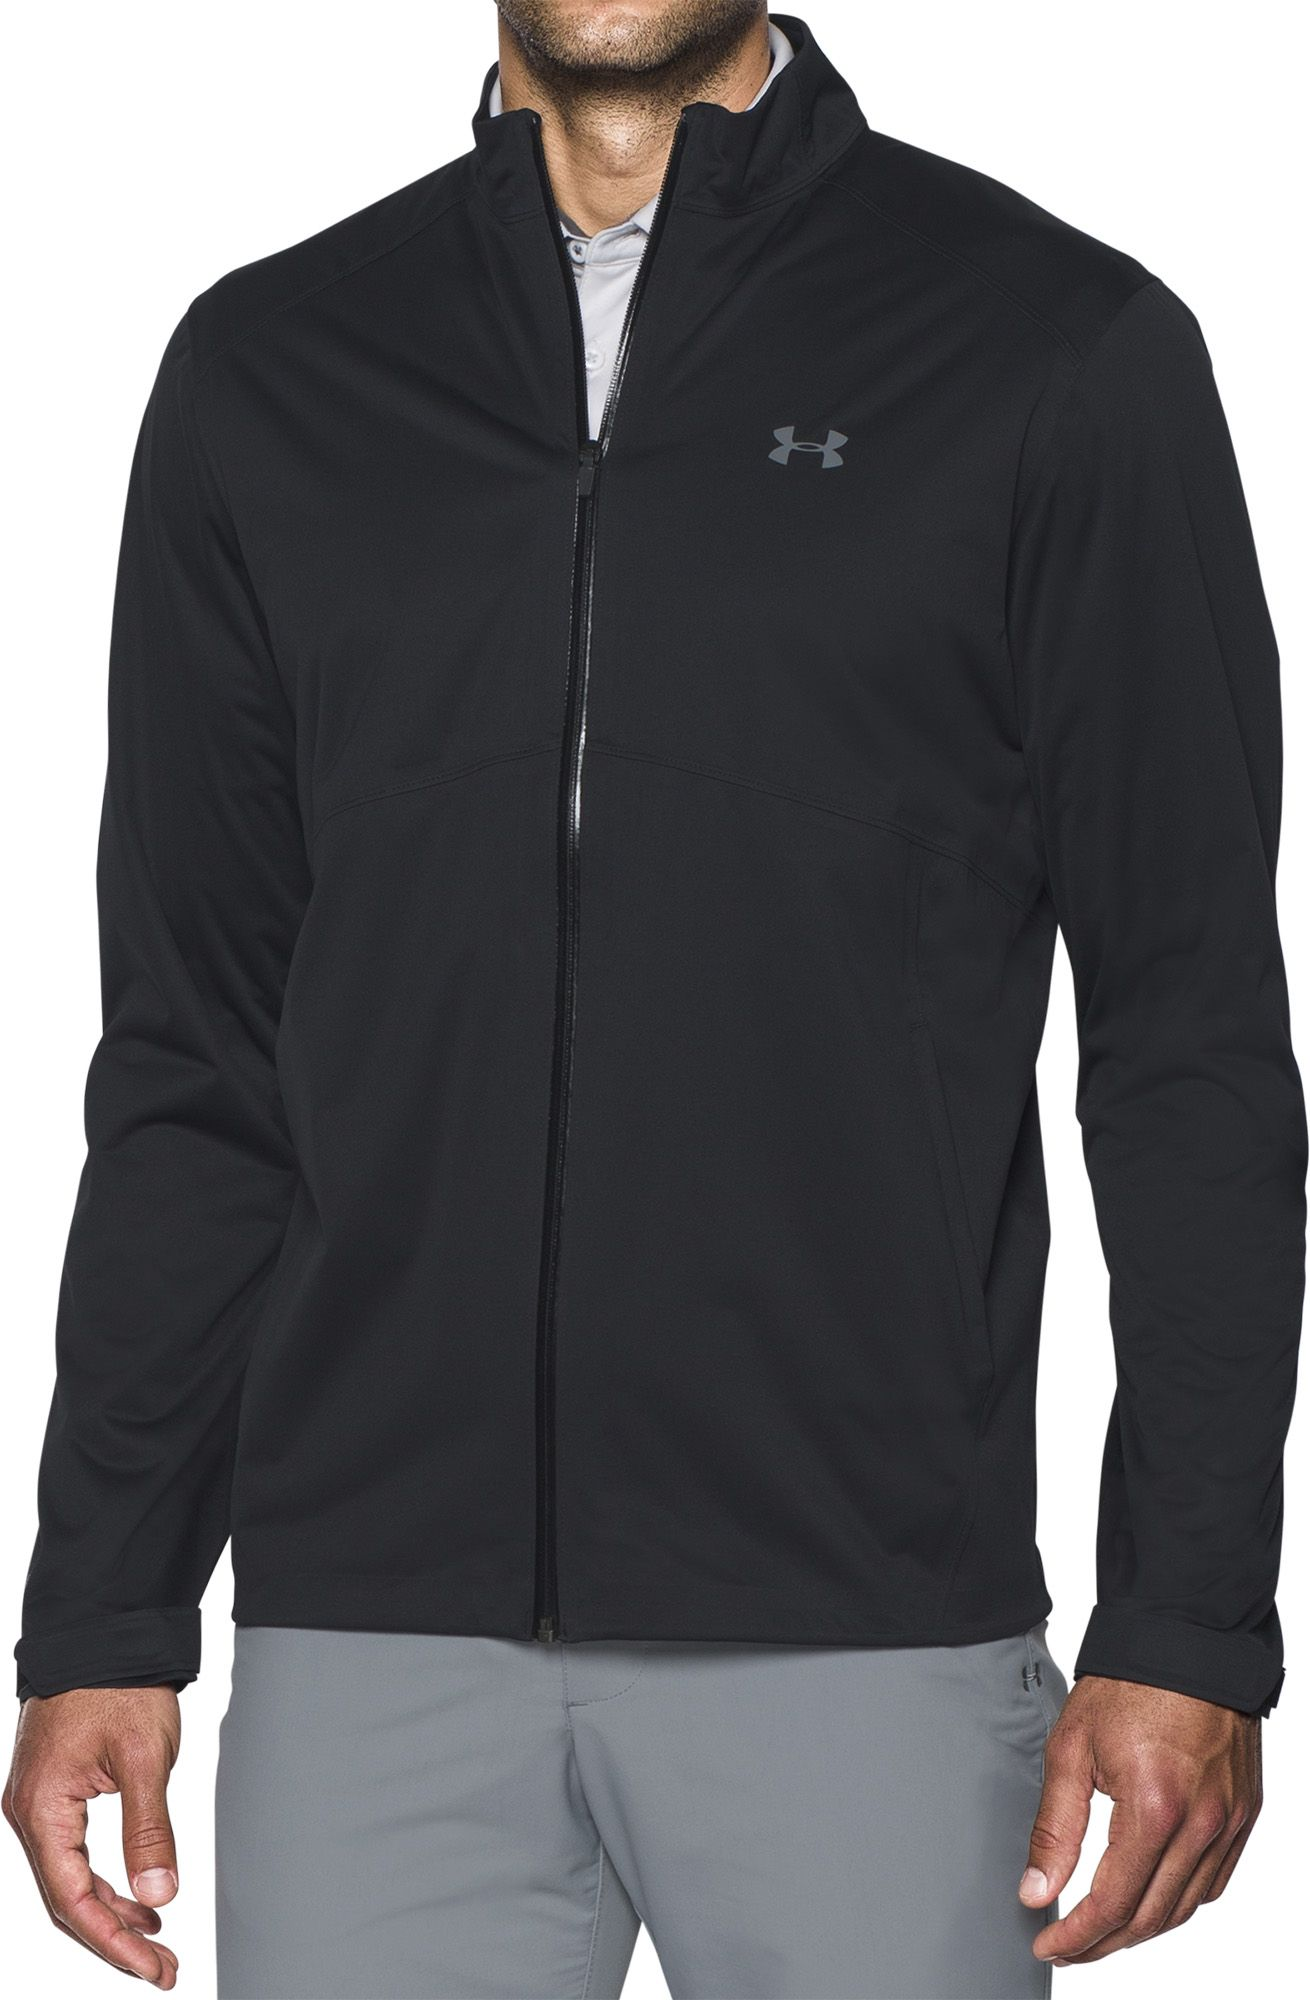 Under Armour Storm 3 Jacket Golf Jackets Mens Golf